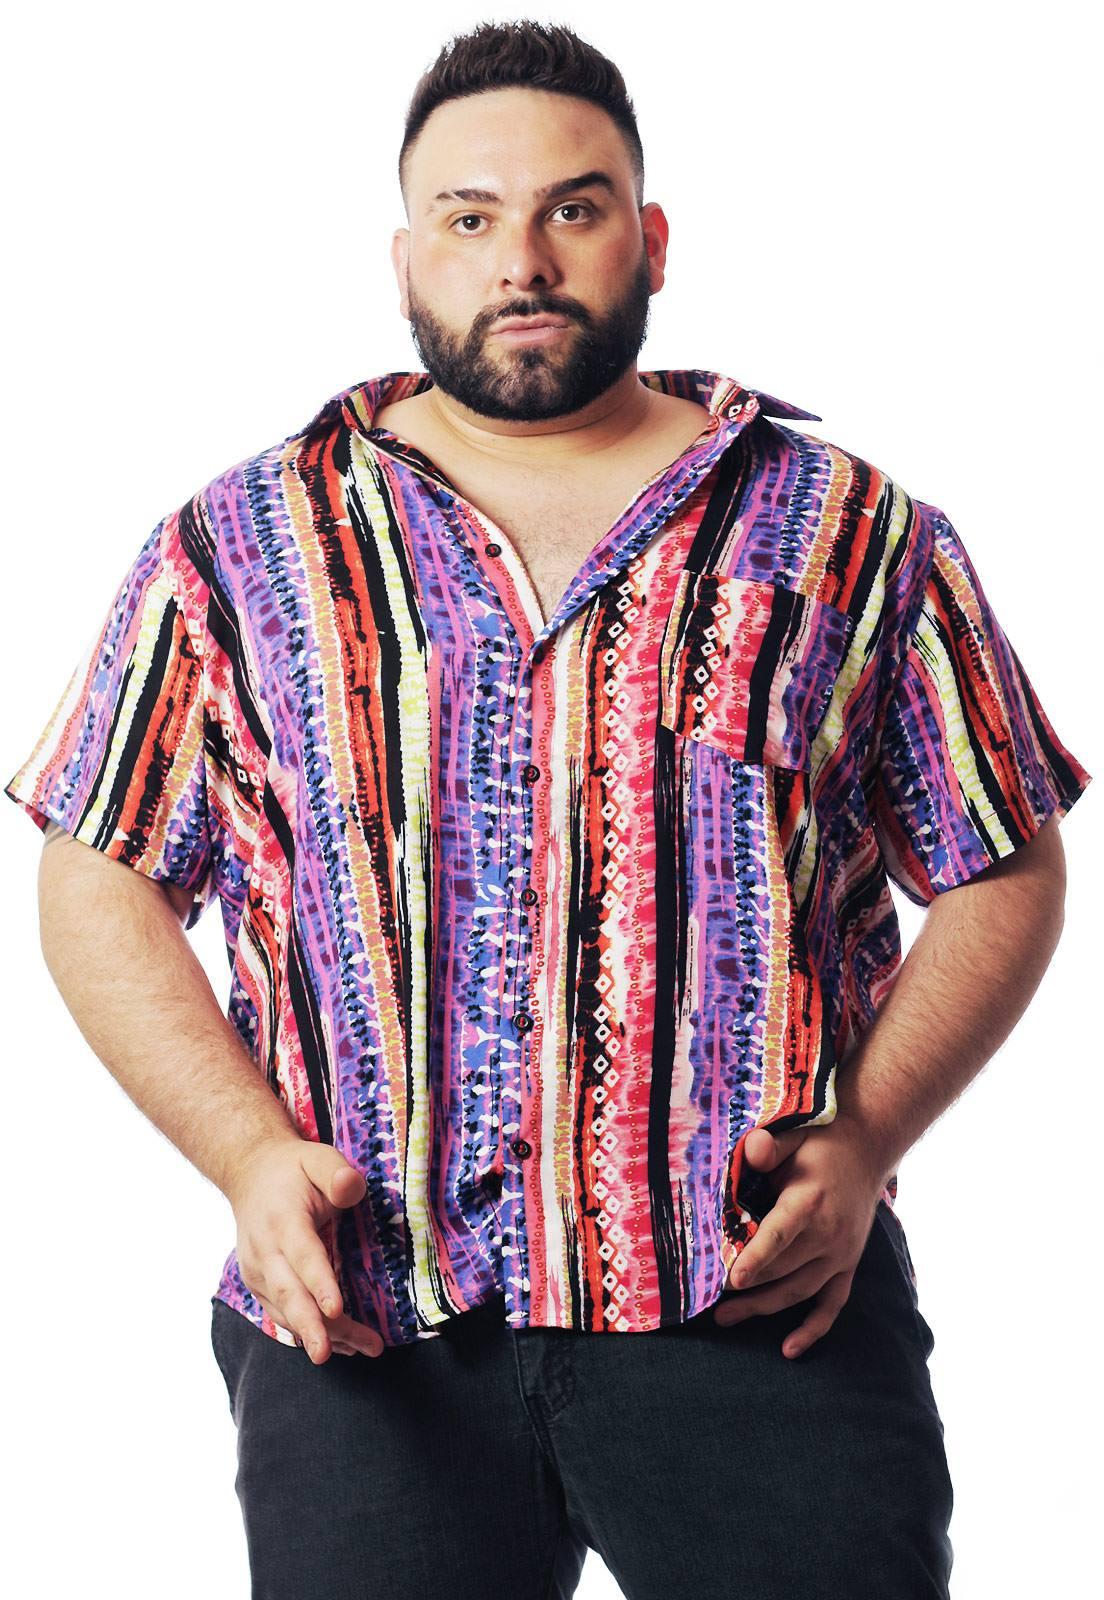 Camisa Plus Size Estampada Viscose Cherry Pop Tribal (P Ao Plus Size)